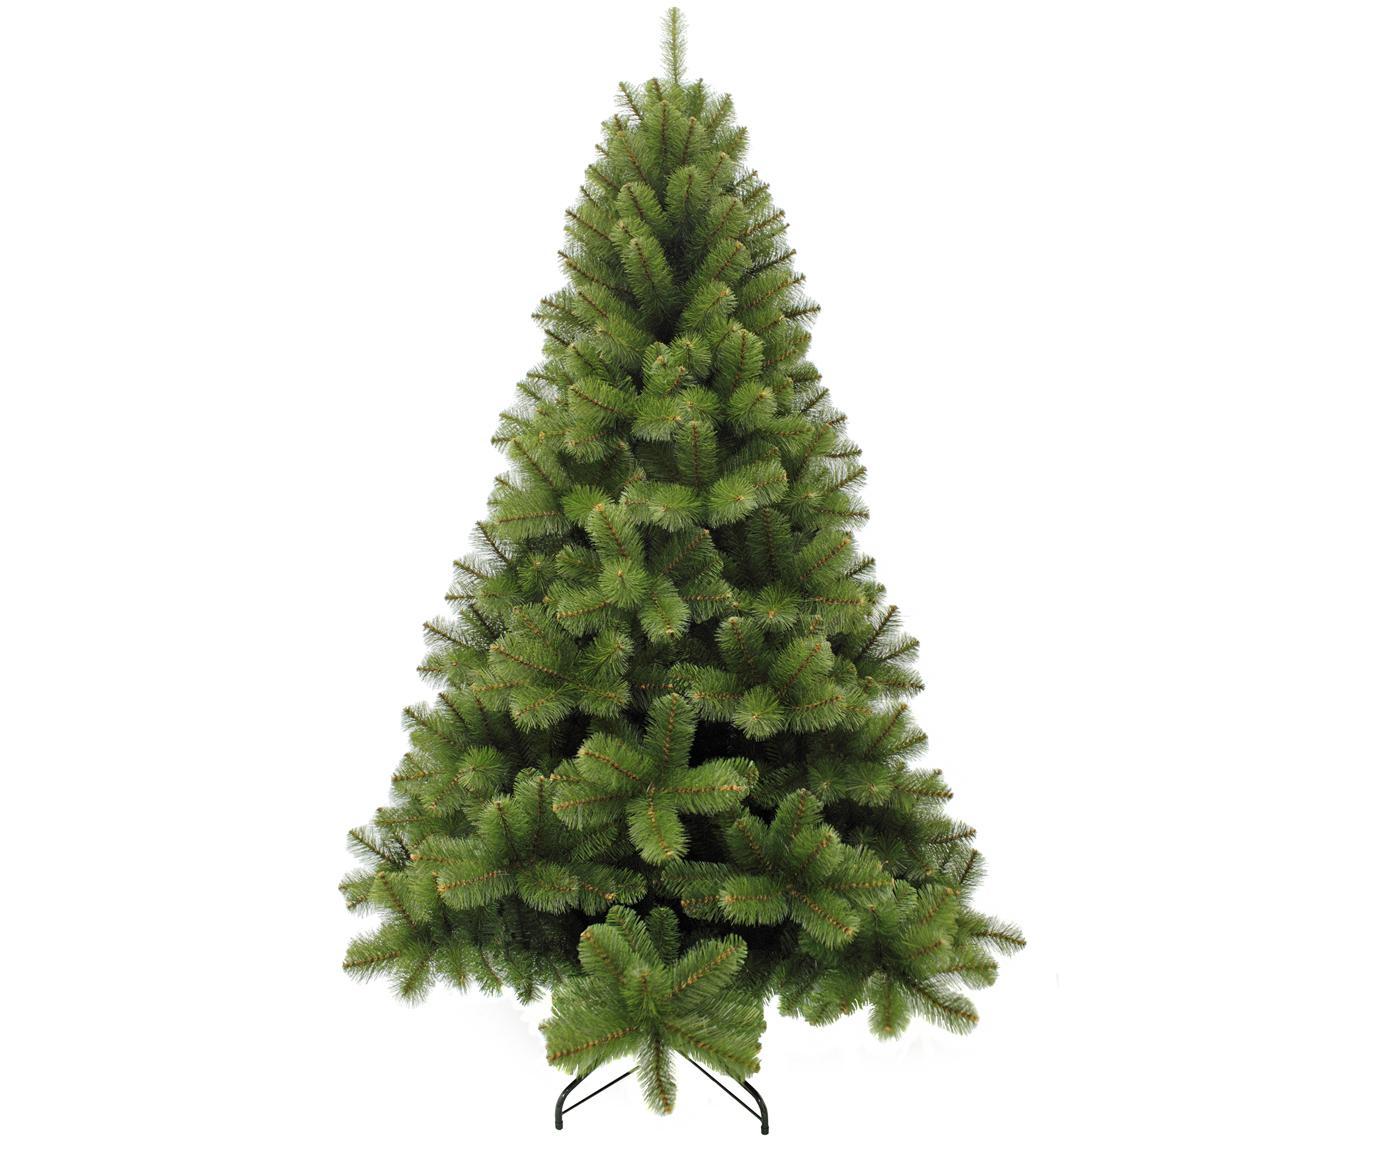 Decoratieve kerstboom Rochdale, Groen, Ø 107 x H 185 cm